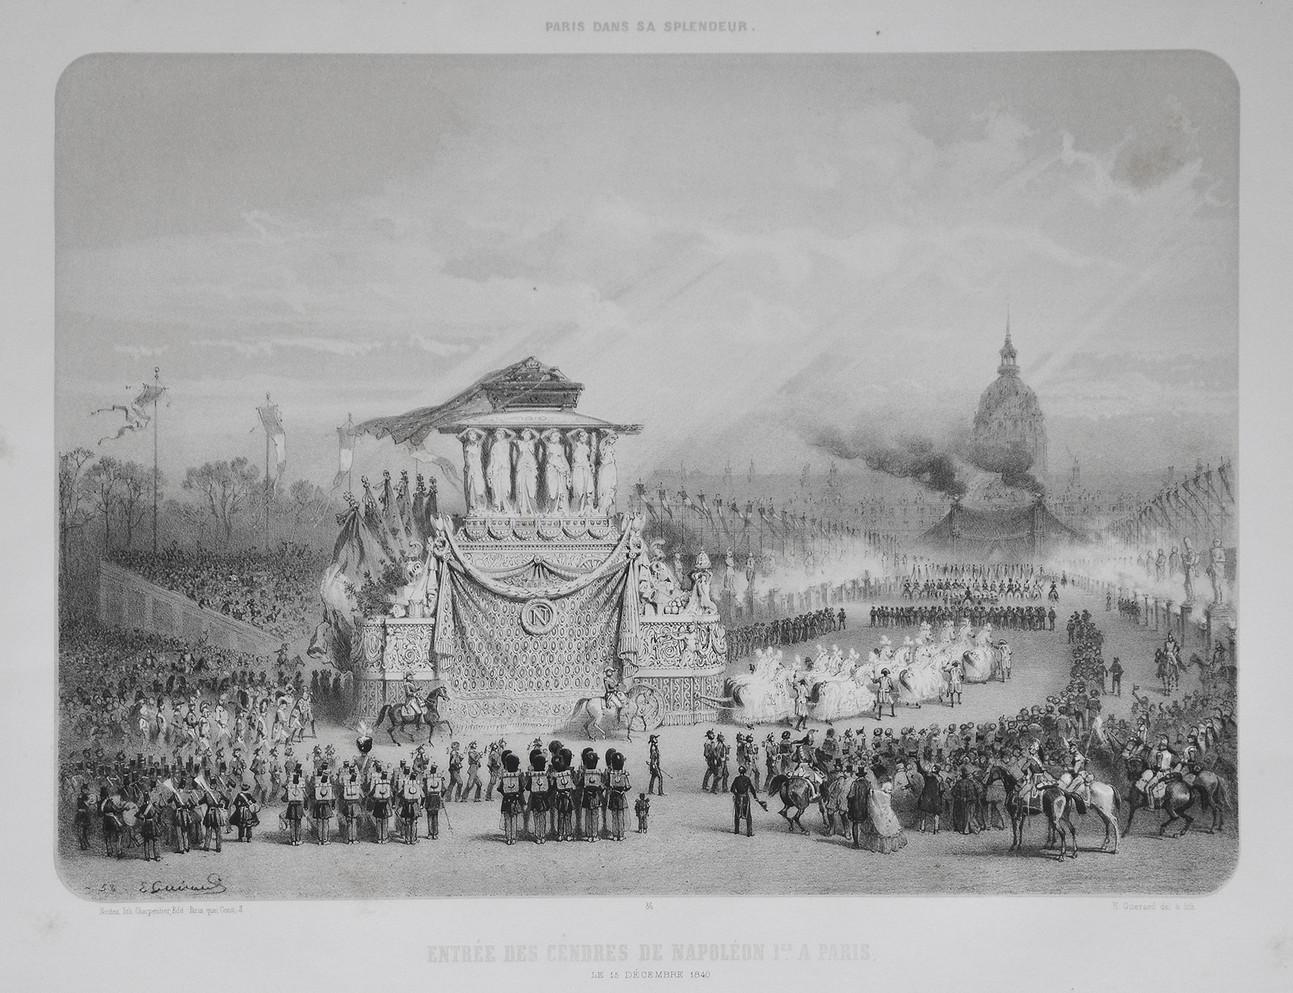 Entrée des cendres de Napoléon Ier